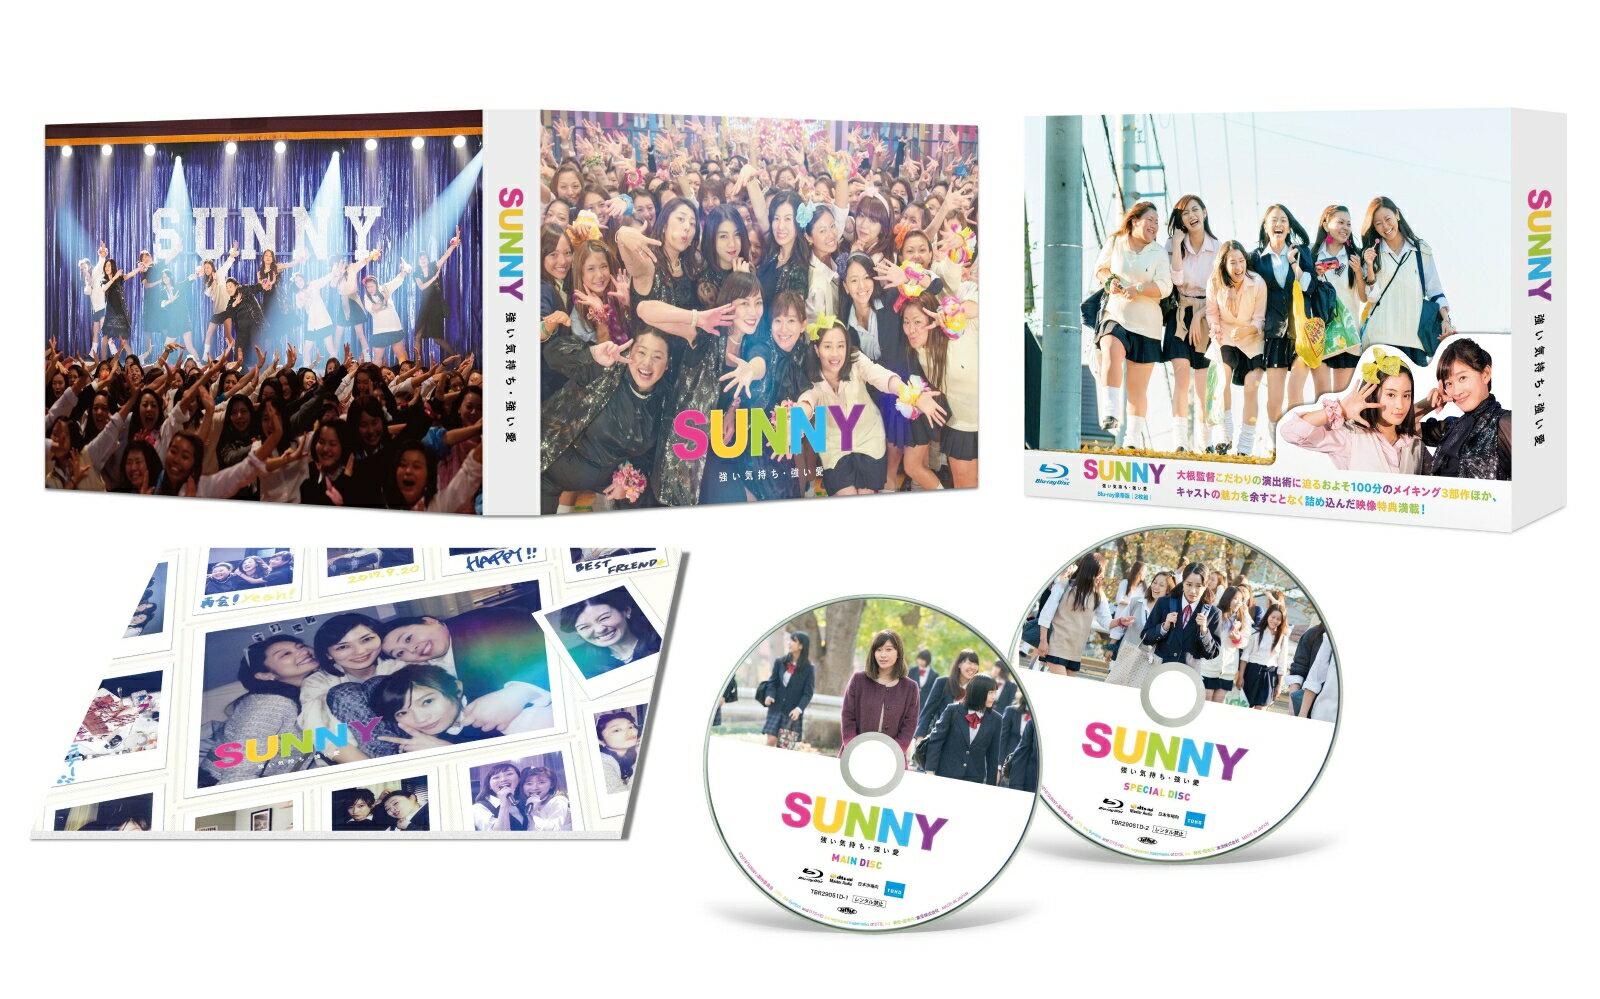 SUNNY 強い気持ち・強い愛 Blu-ray 豪華版【Blu-ray】